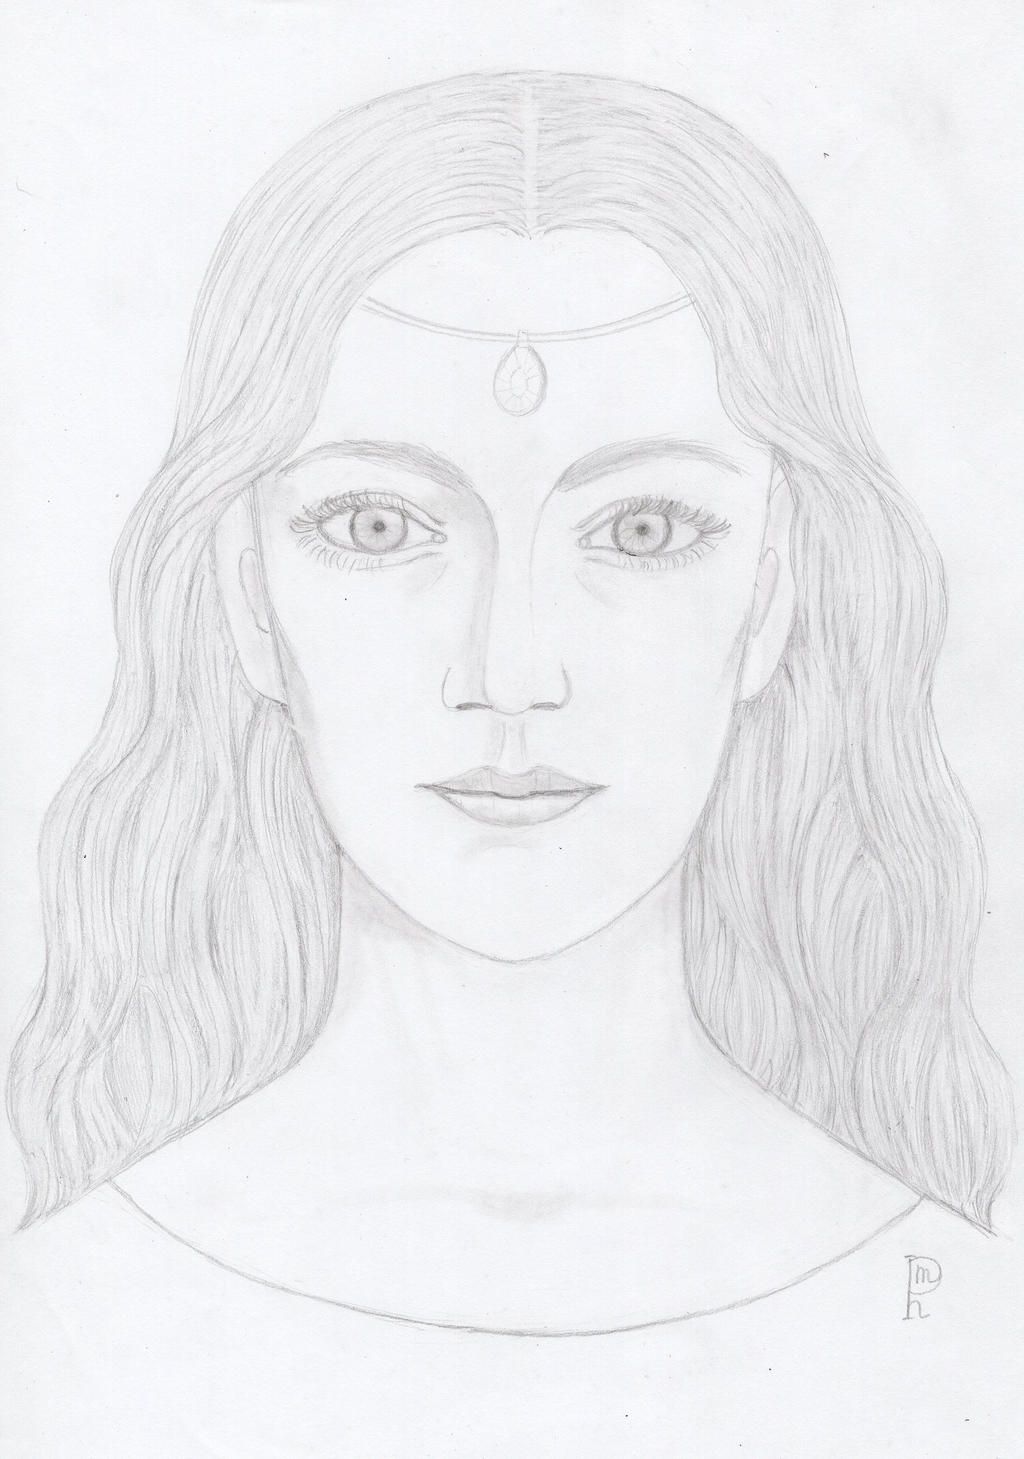 Queen Almarian of Numenor